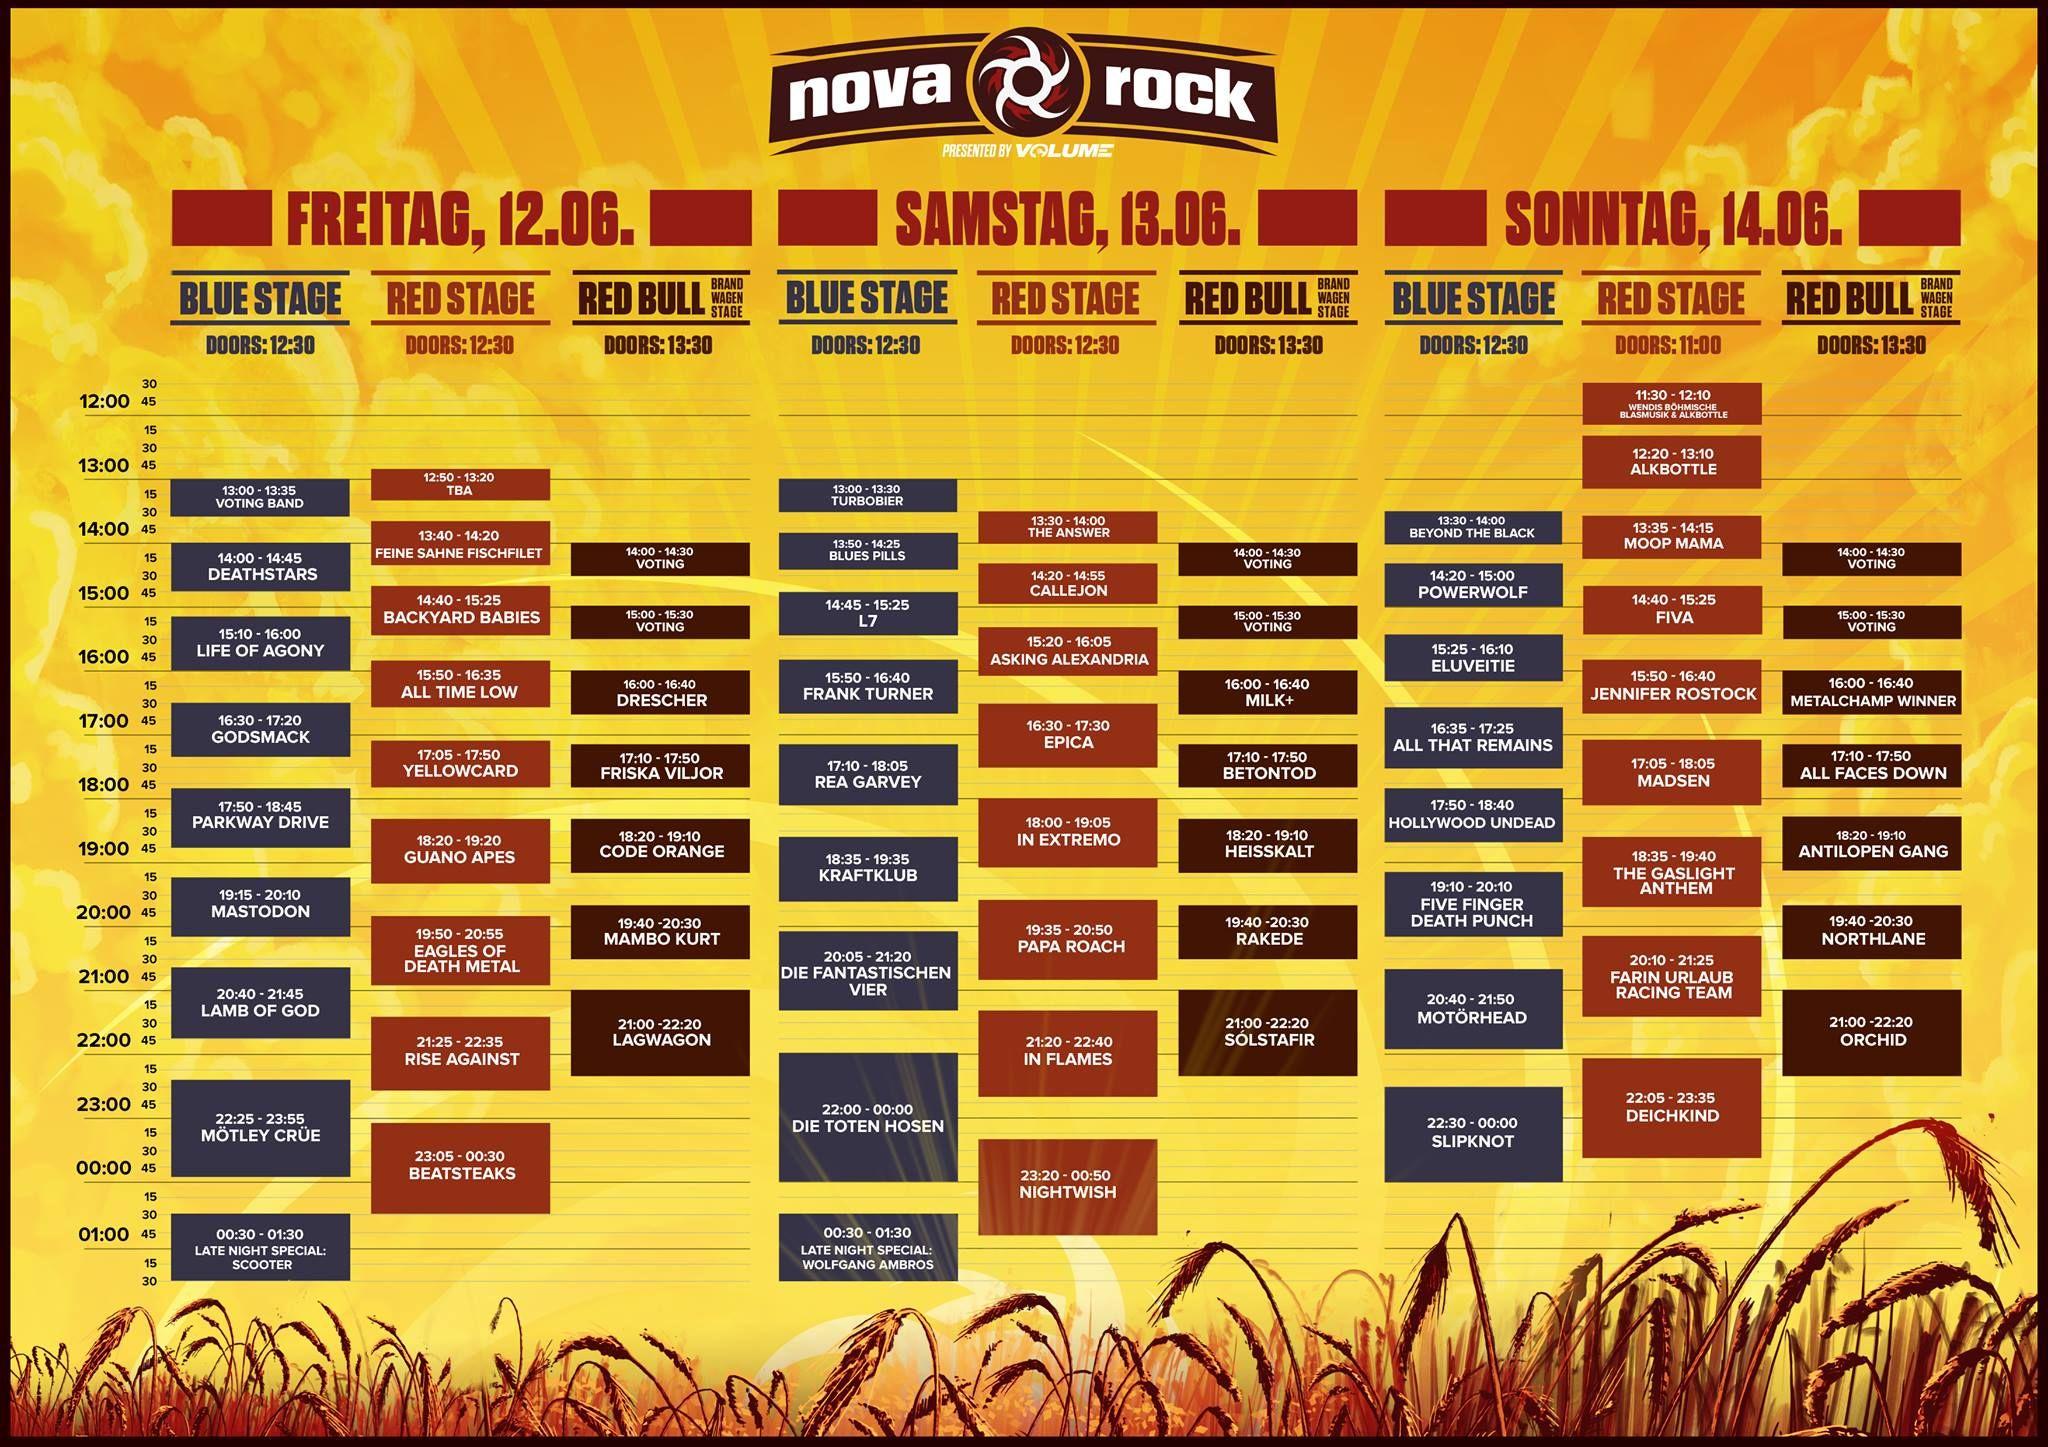 nova_rock_time_table2015.jpg